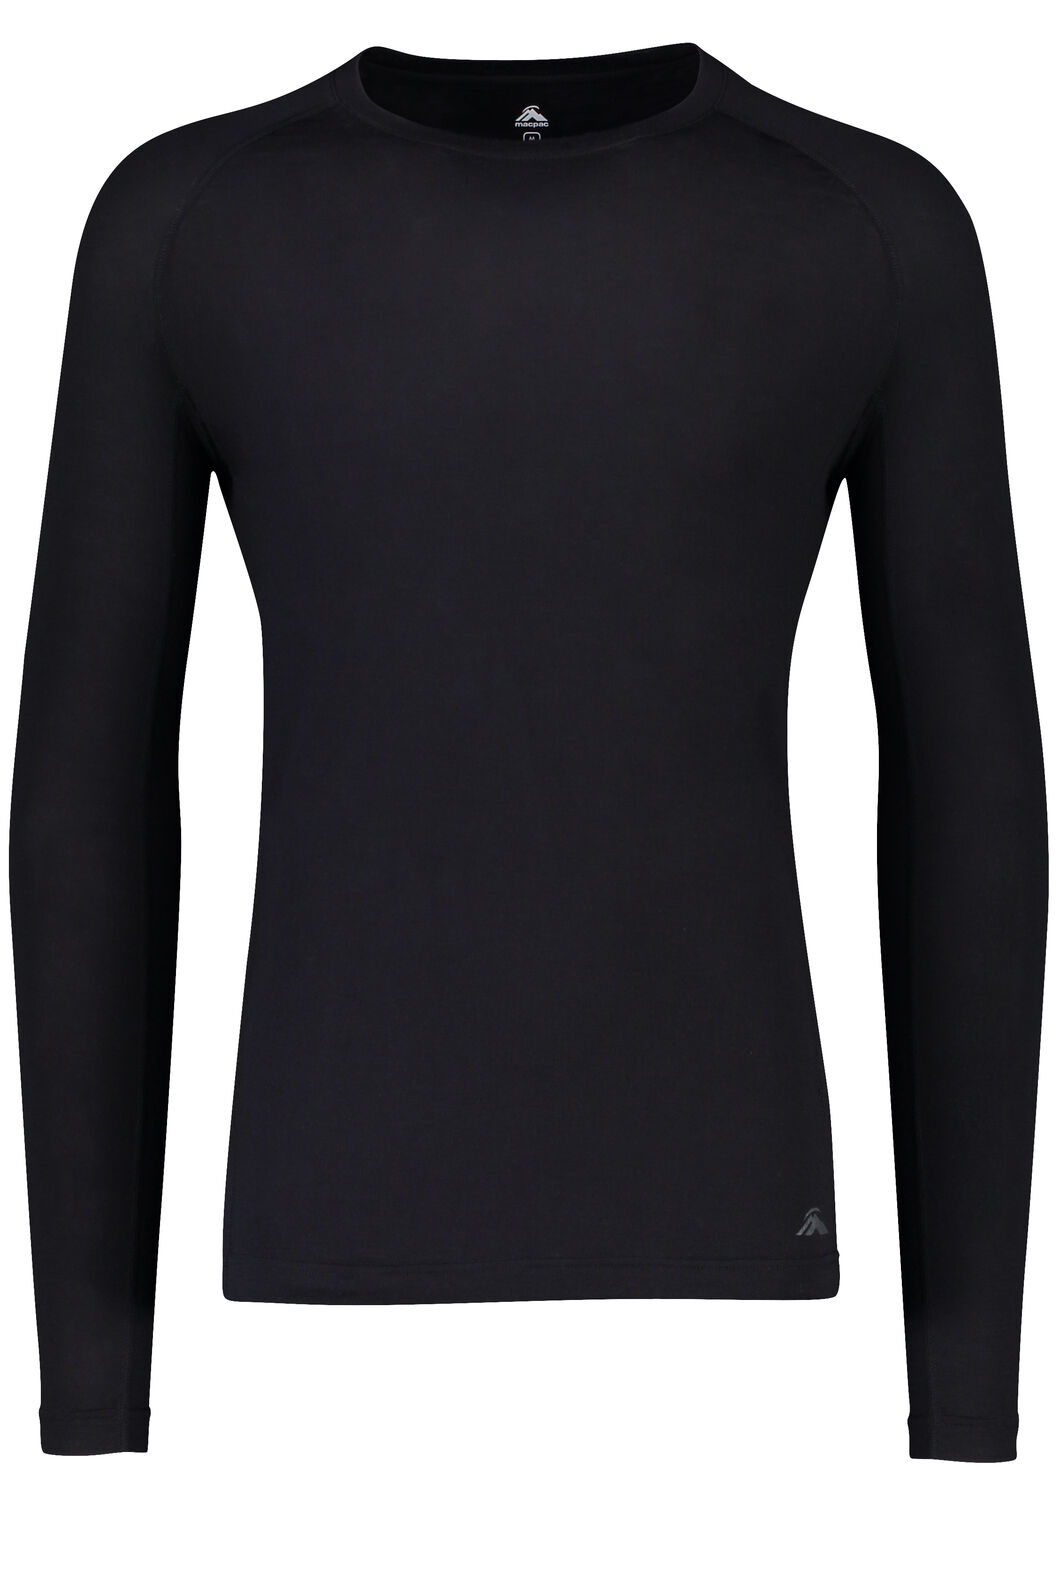 150 Merino Long Sleeve Top - Men's, Black, hi-res